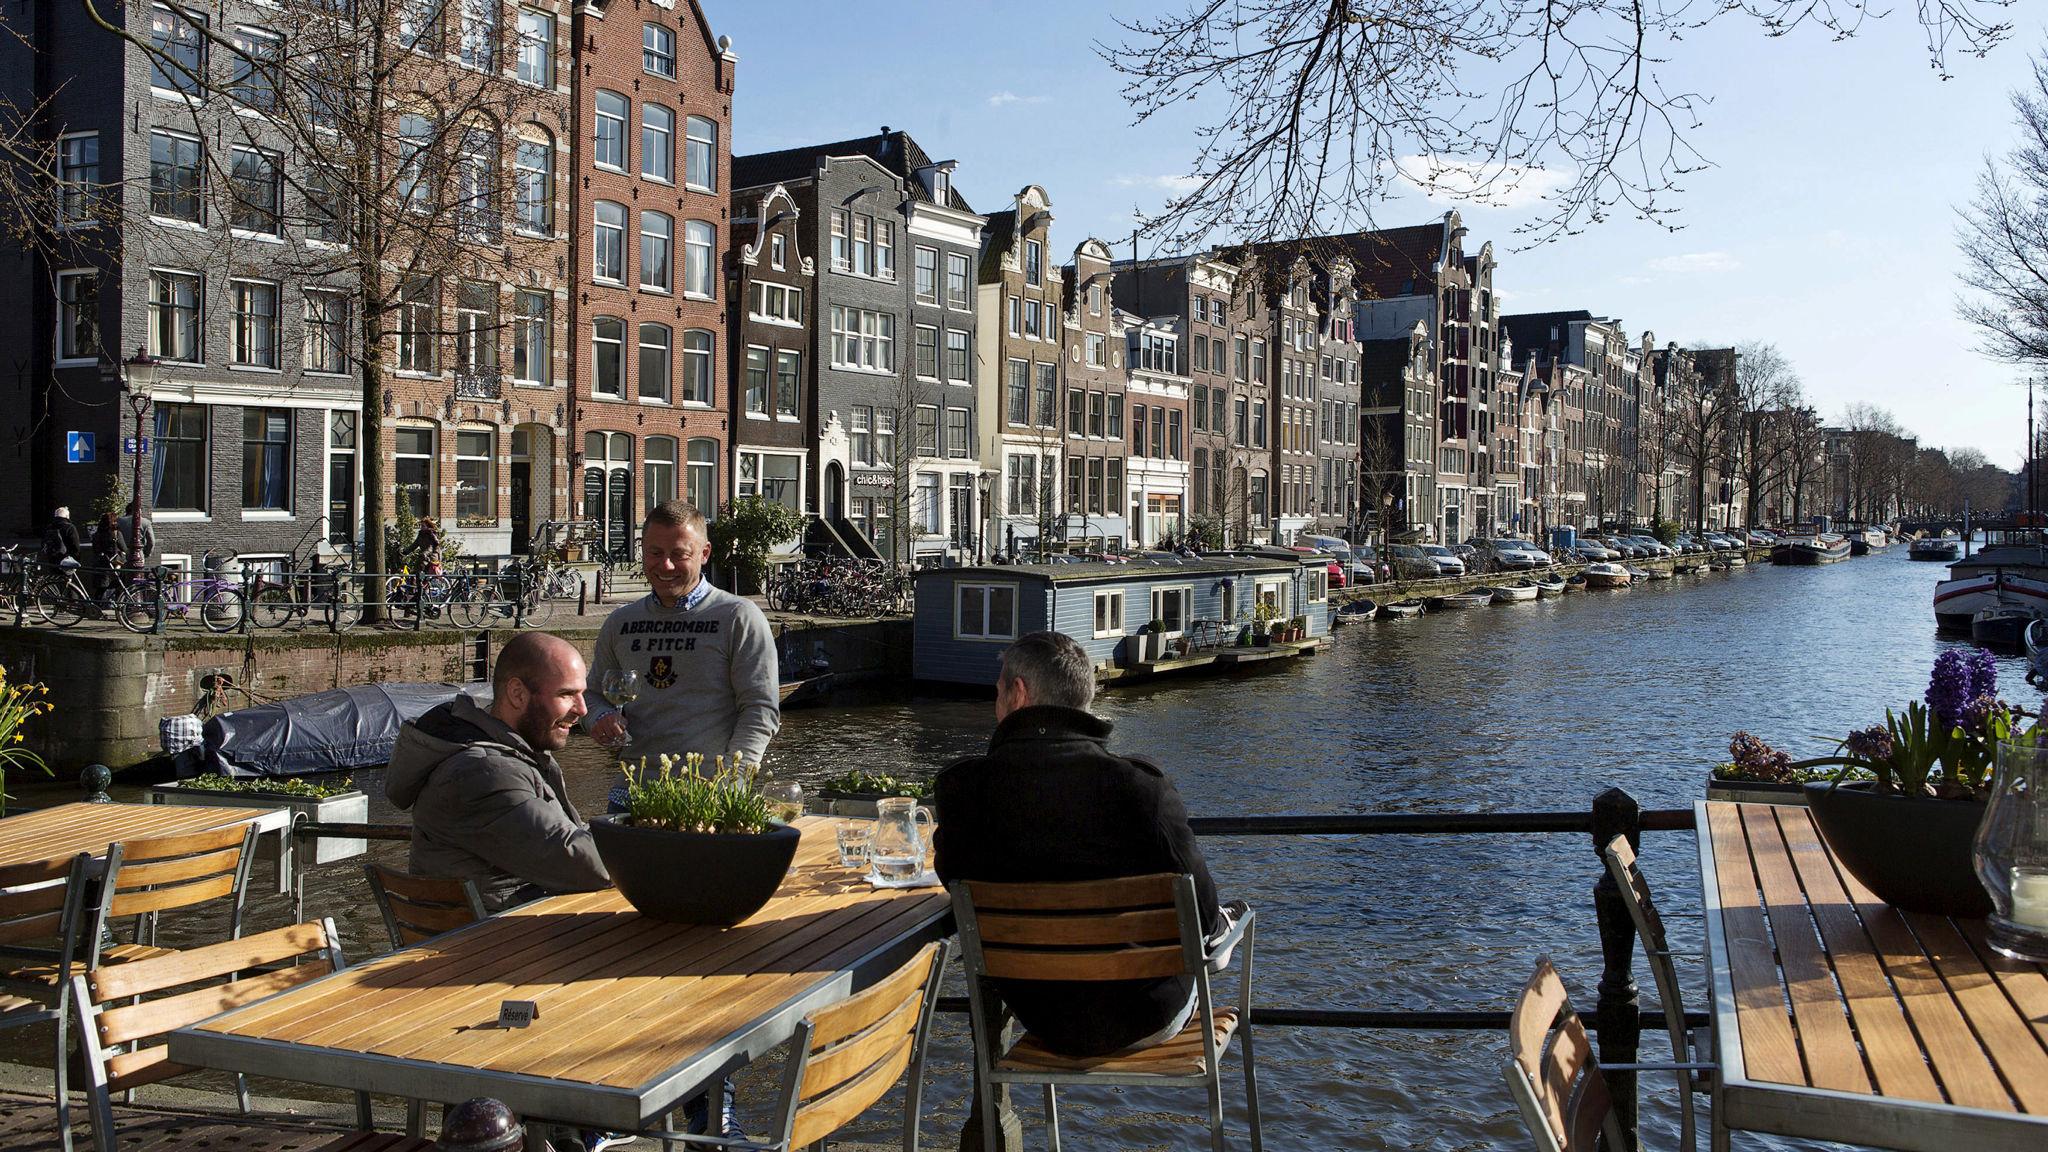 Cboe readies Amsterdam hub despite Brexit uncertainty